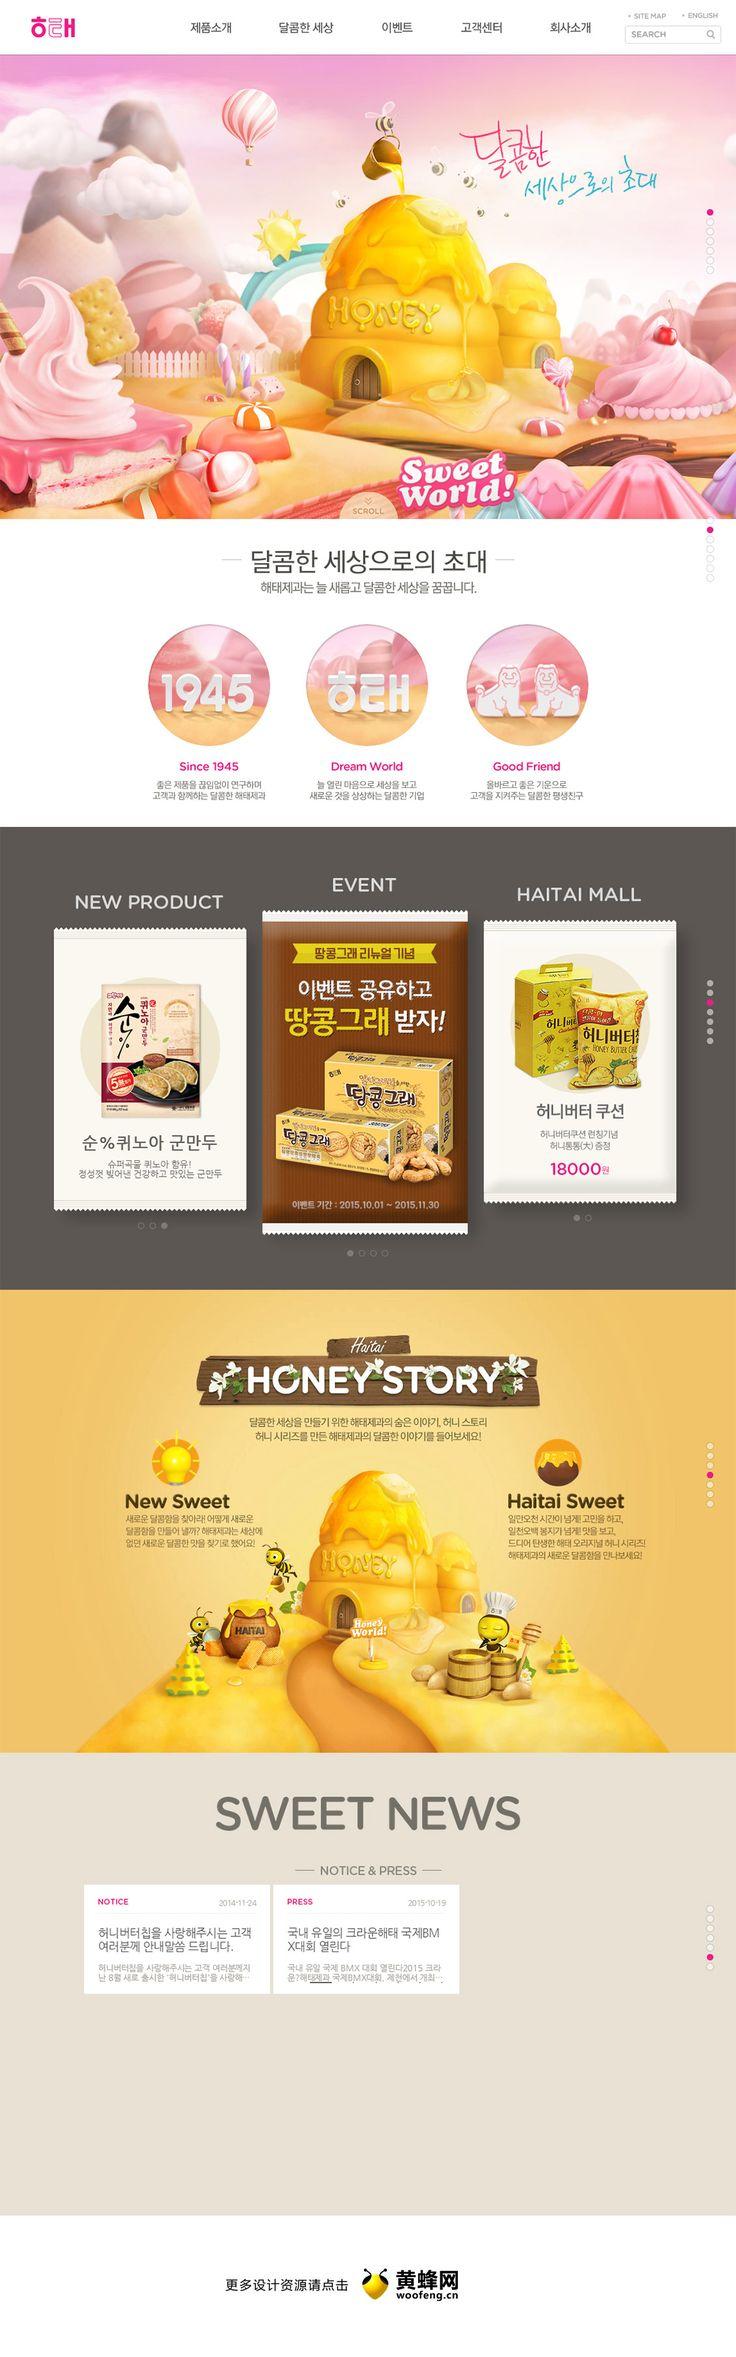 HONEY美食网站,来源自黄蜂网http://woofeng.cn/